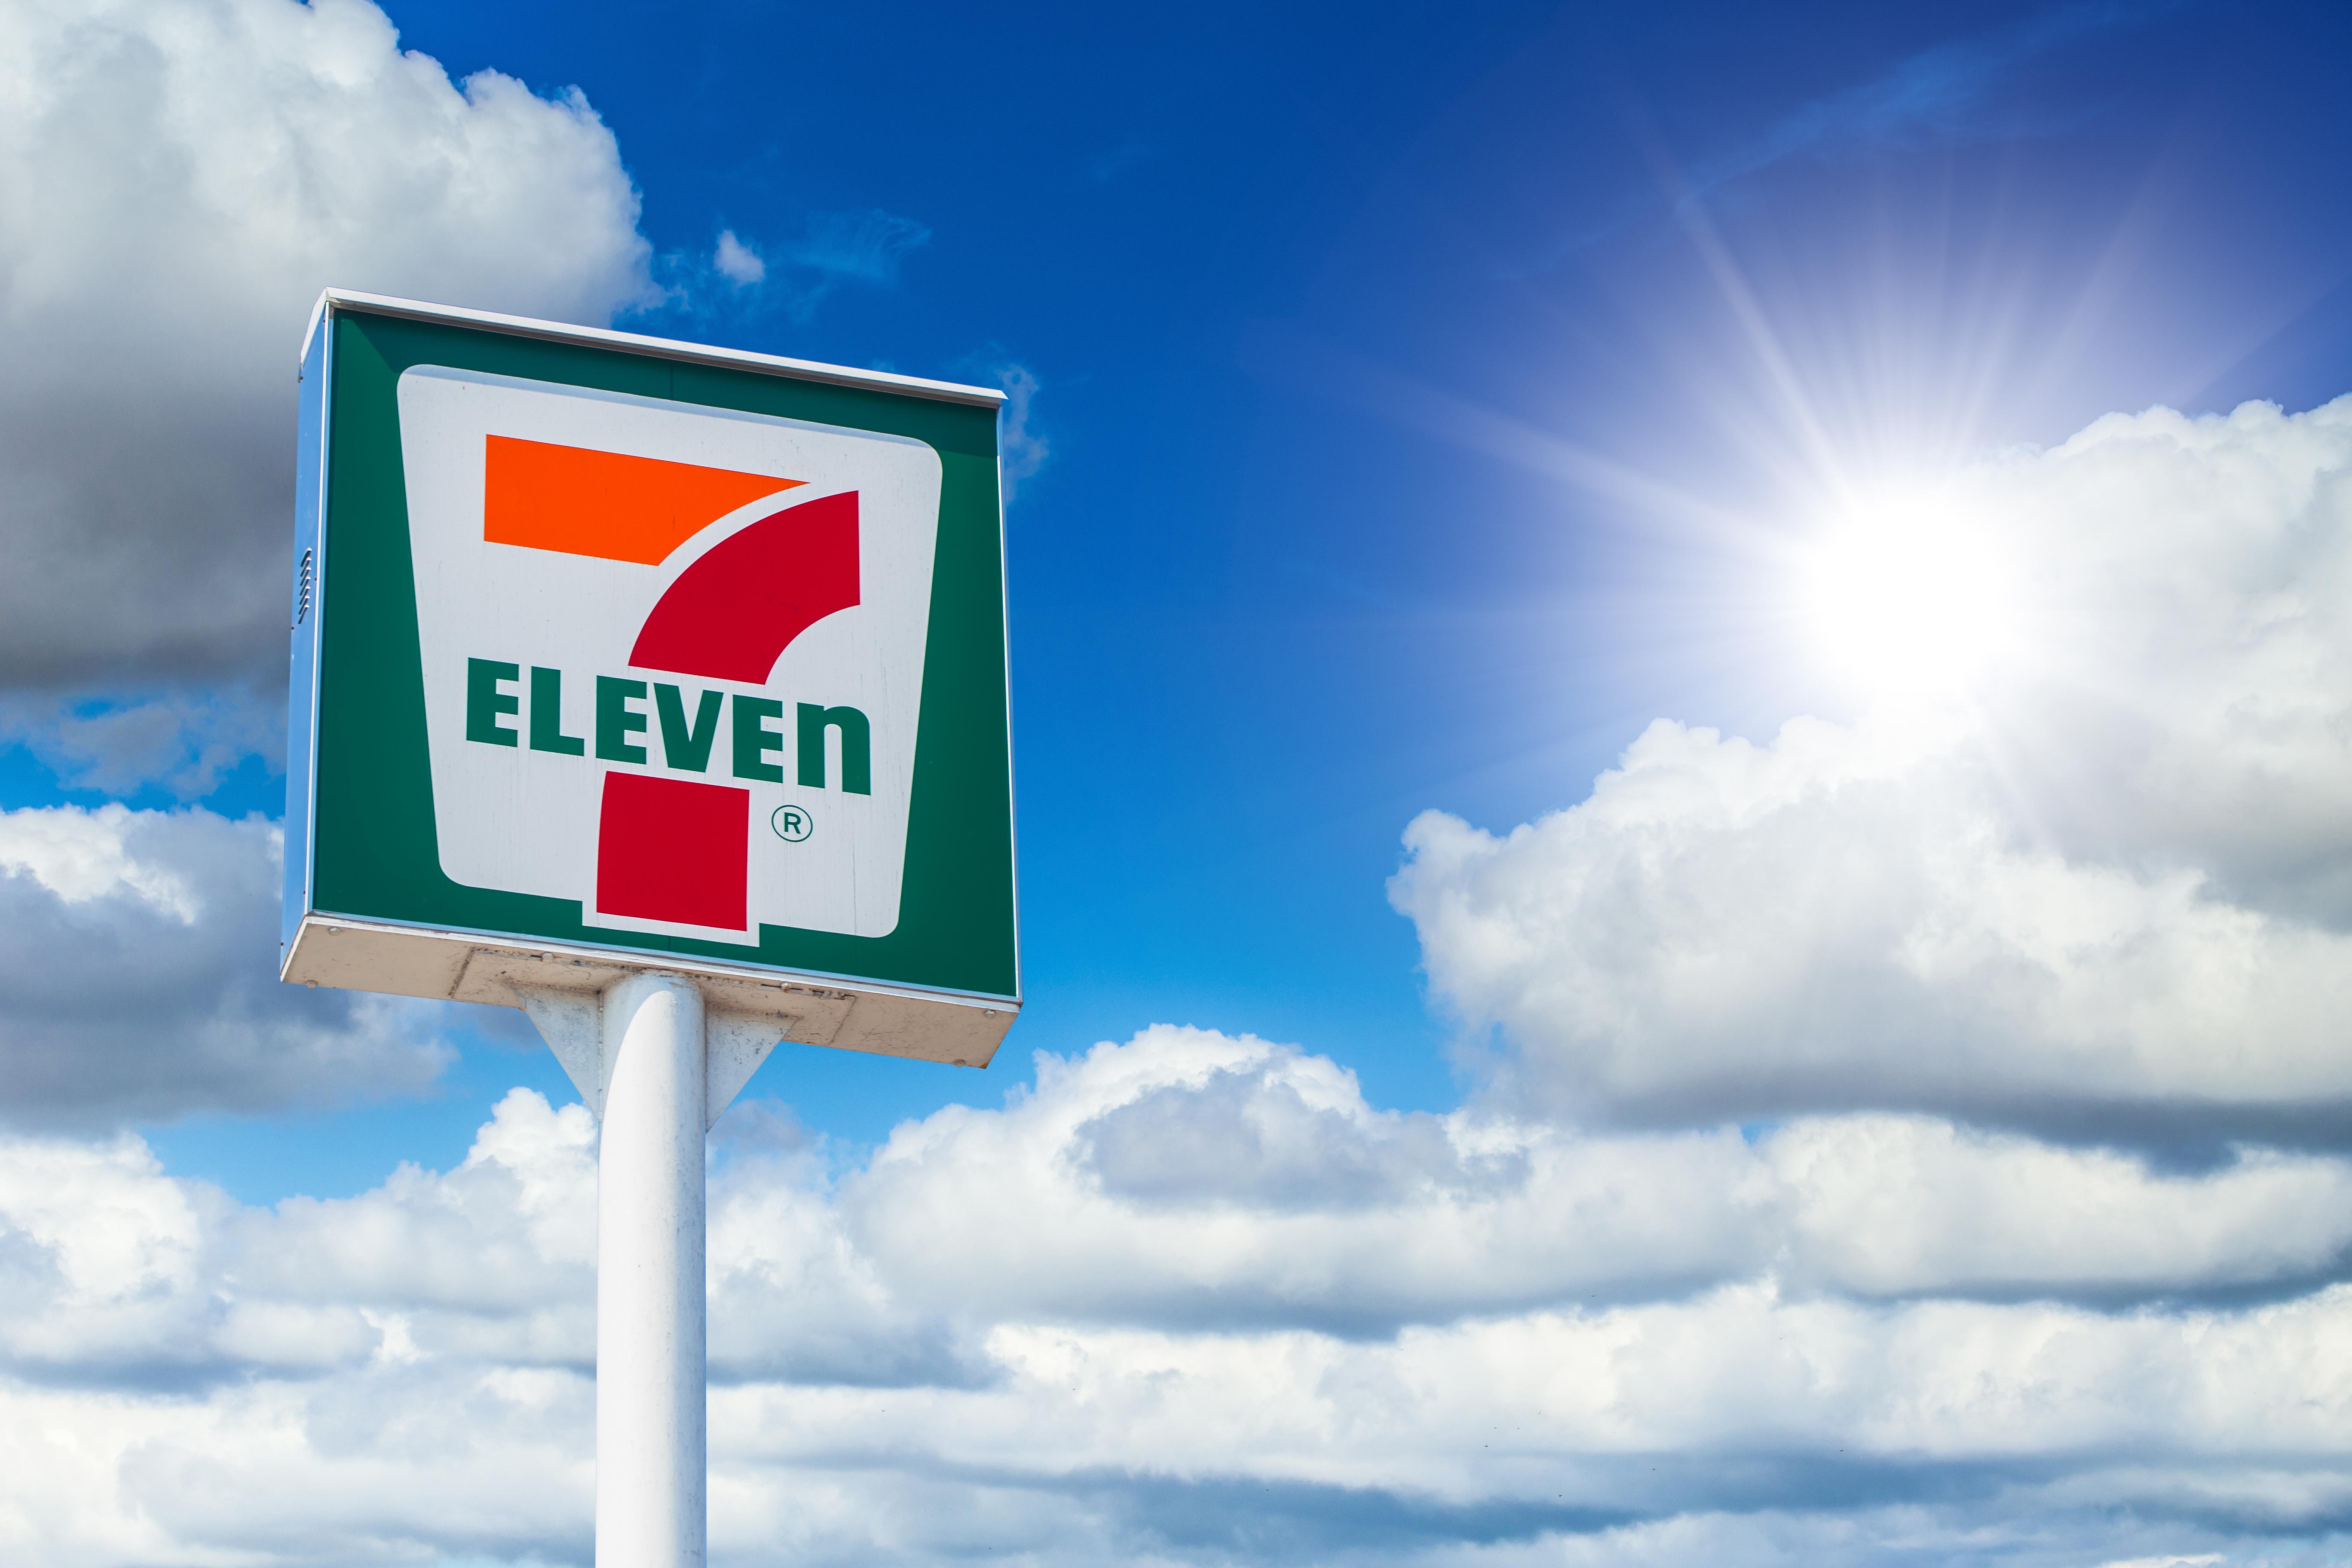 Convenience Store Market Research, 7-Eleven, and Beyoncé